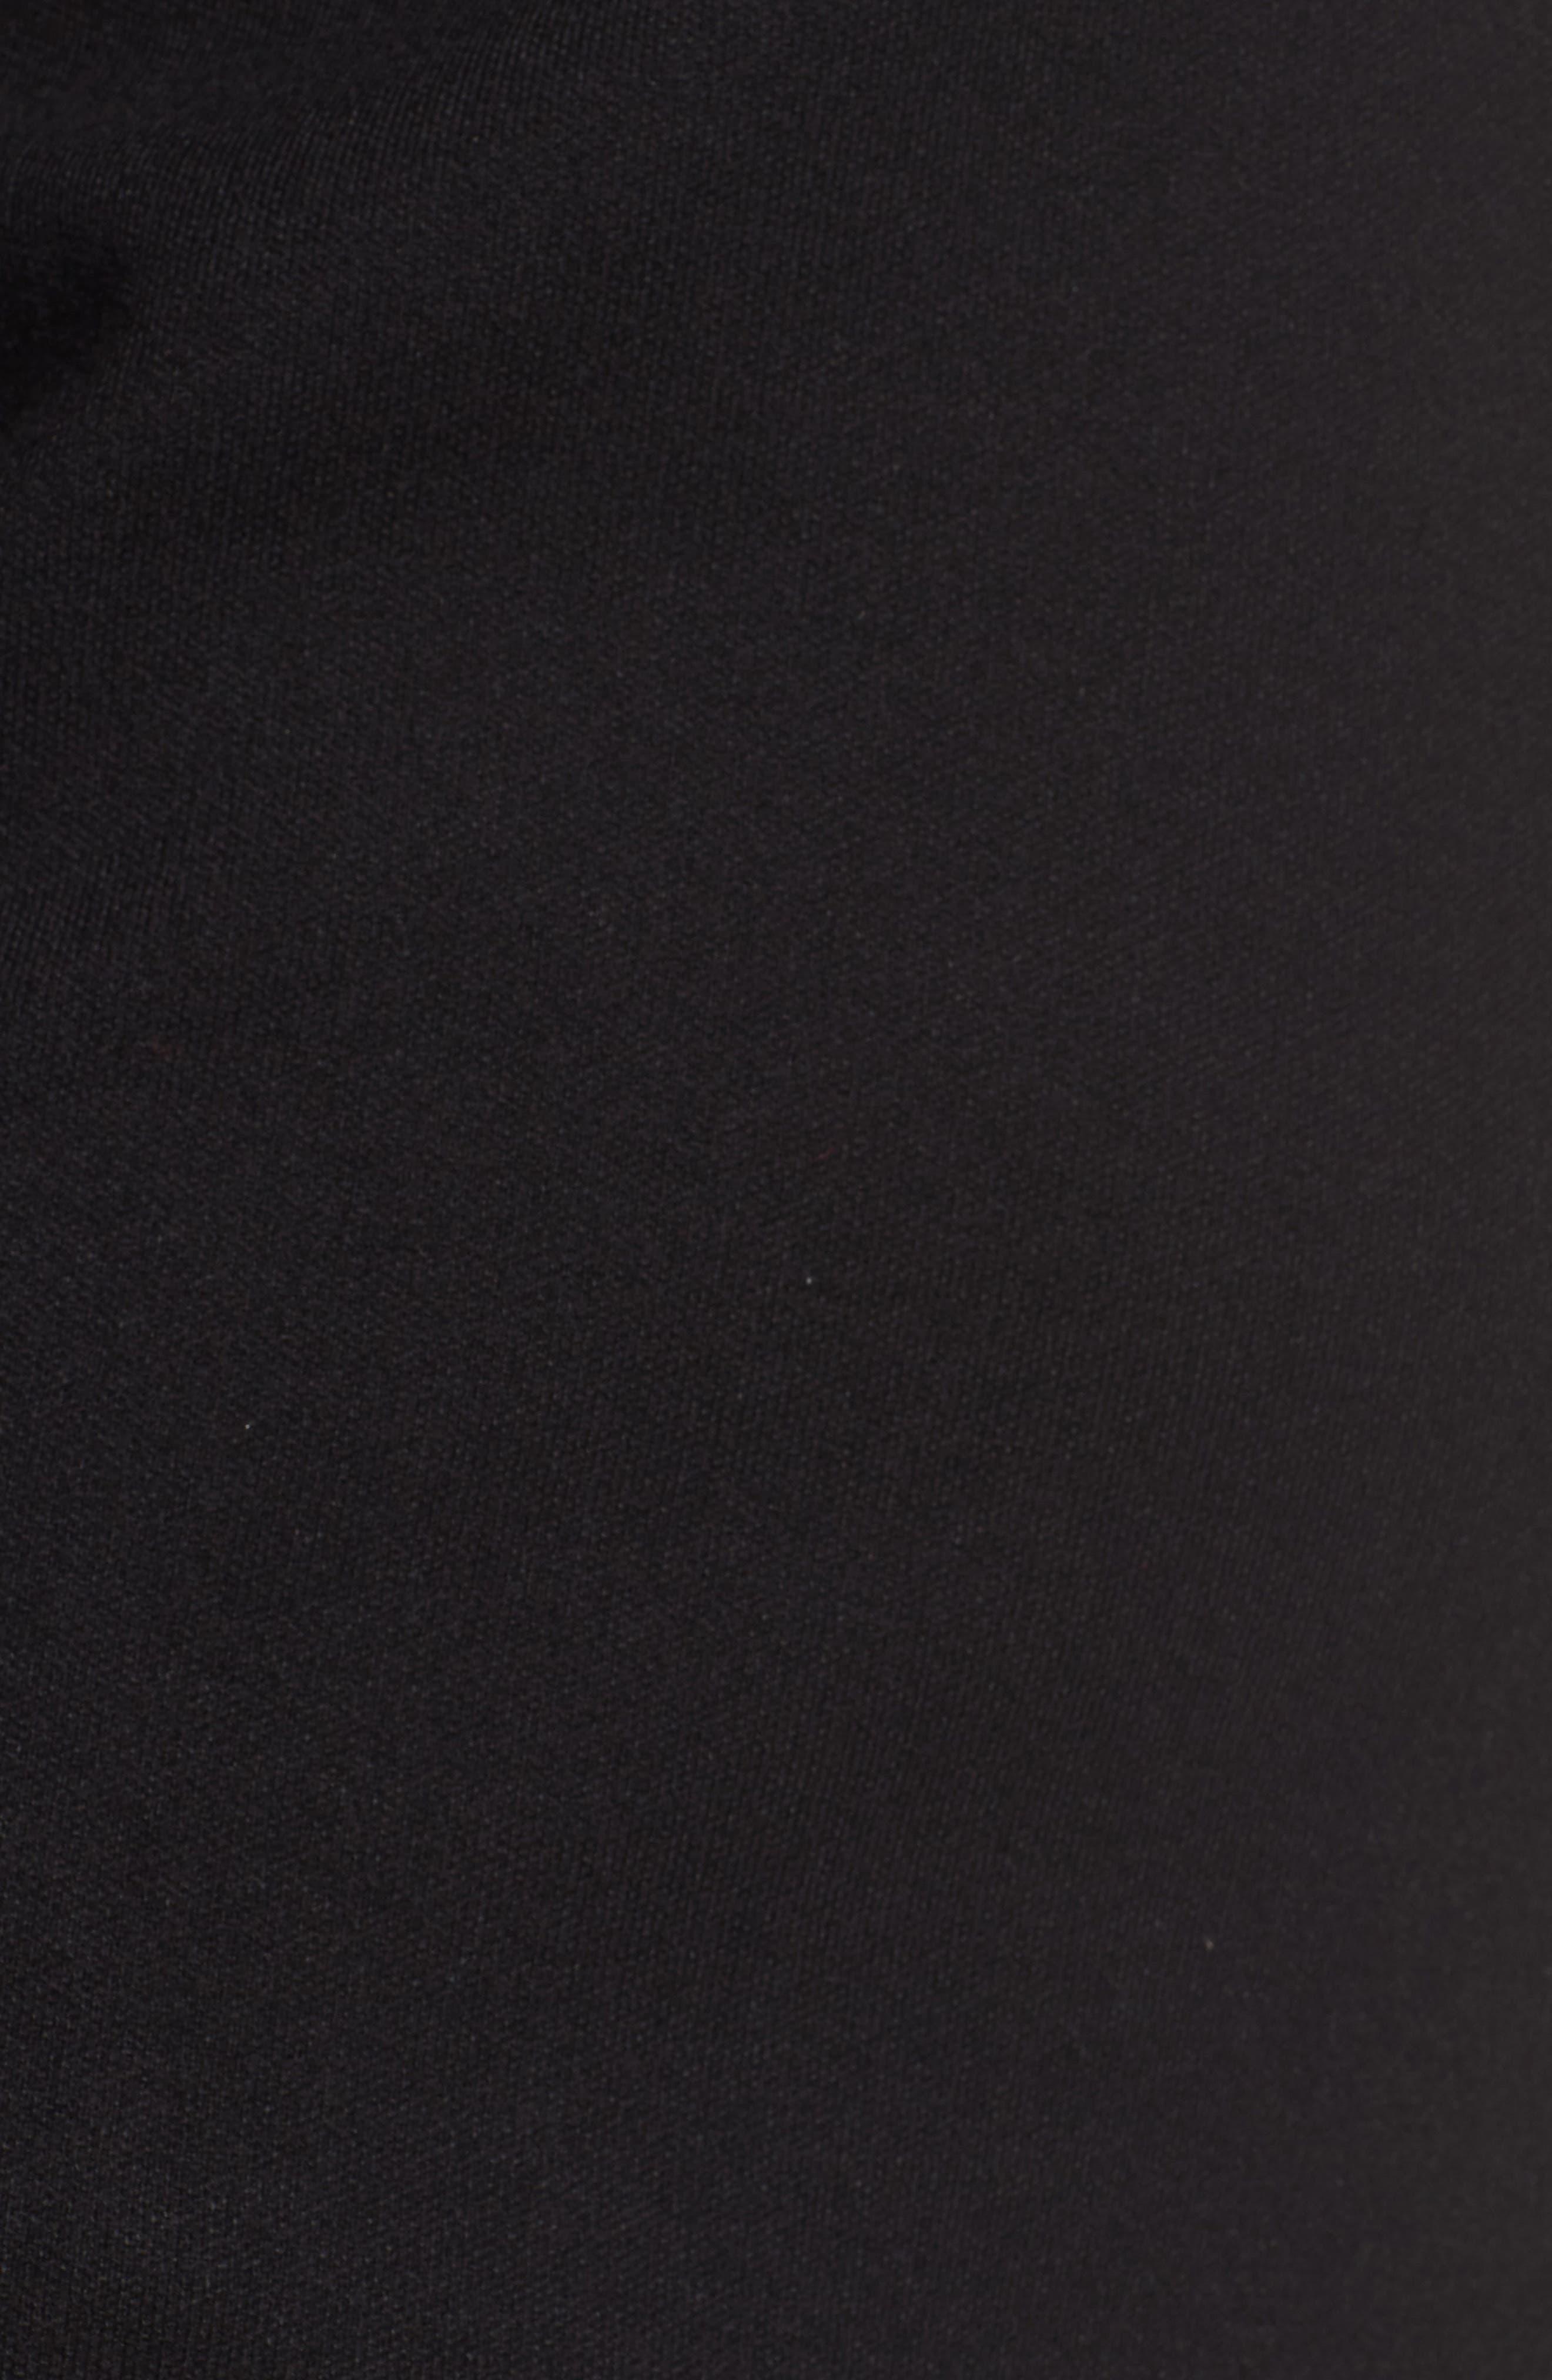 Ruffle Sleeve Sweater Dress,                             Alternate thumbnail 5, color,                             Black